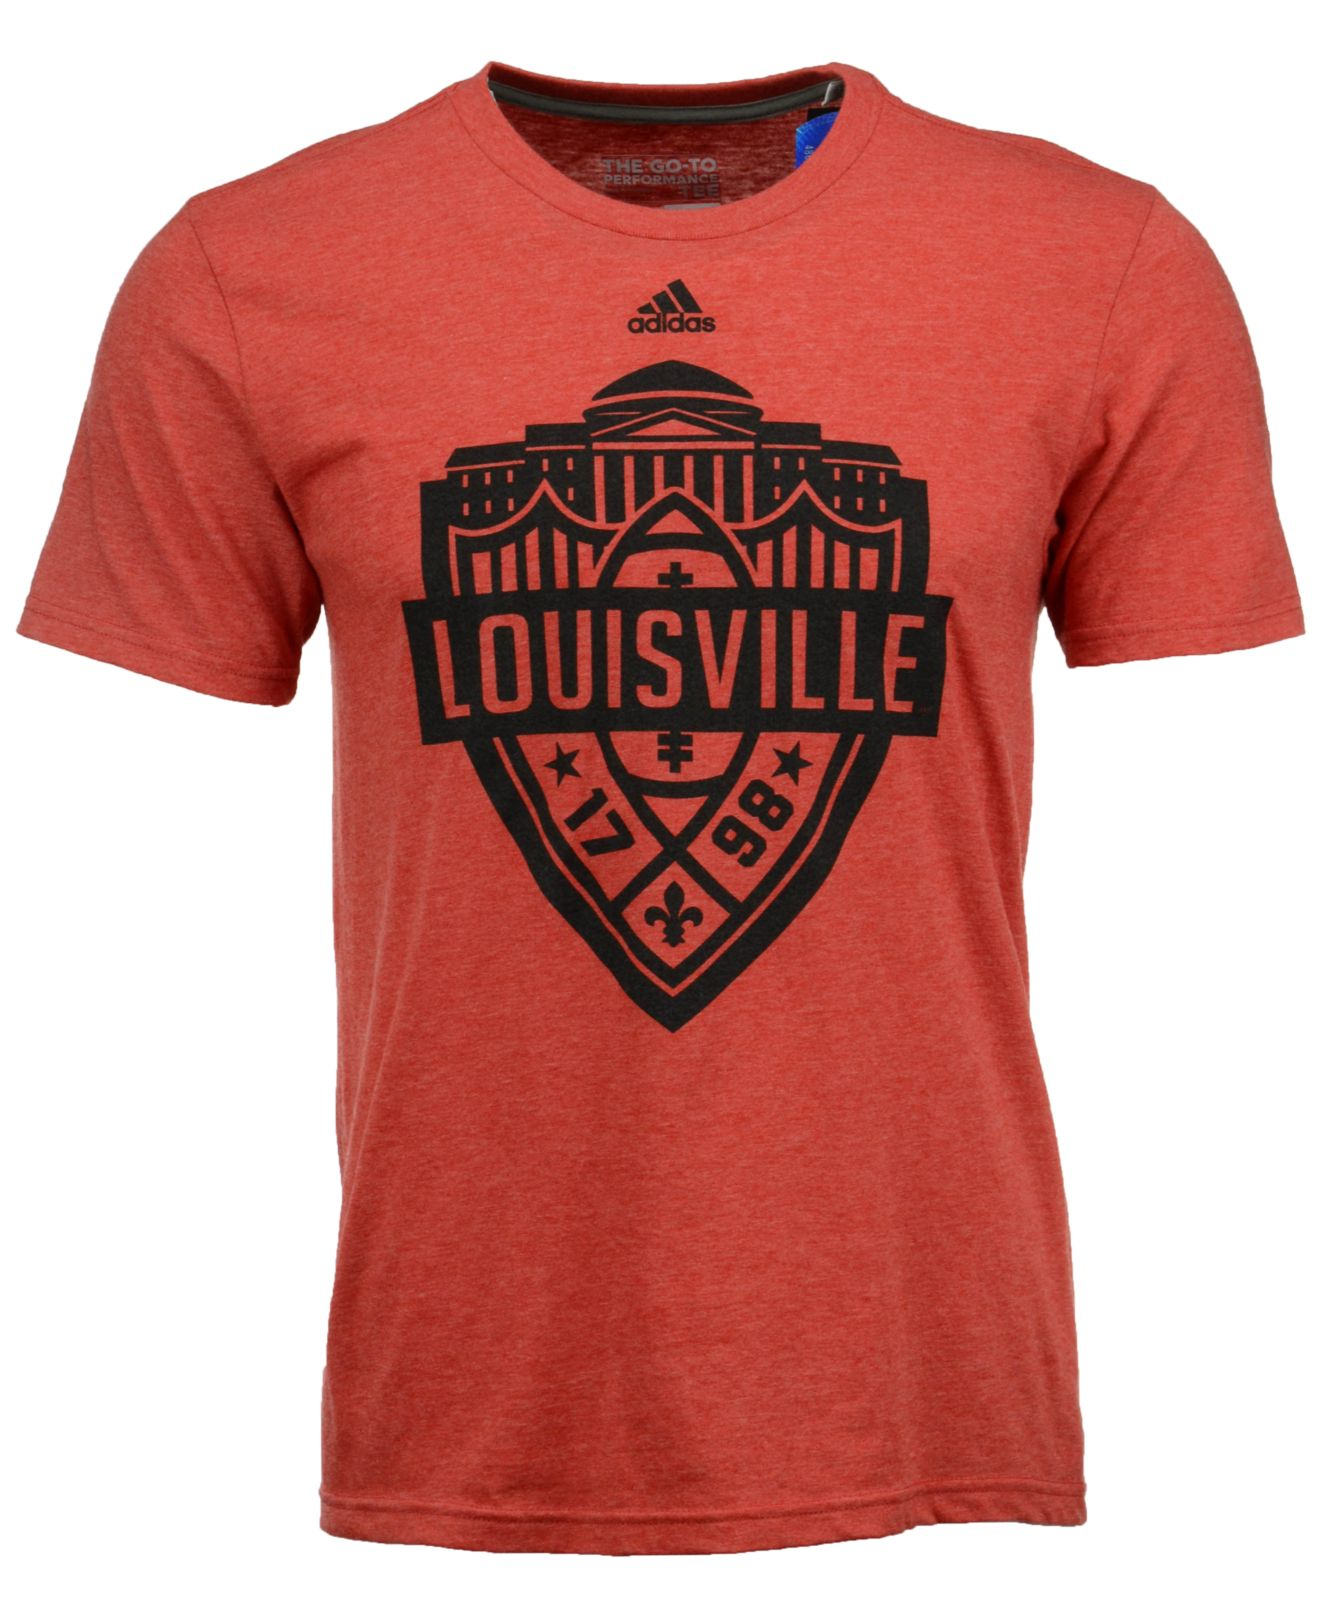 Adidas originals men 39 s louisville cardinals landmark crest for Louisville t shirt printing